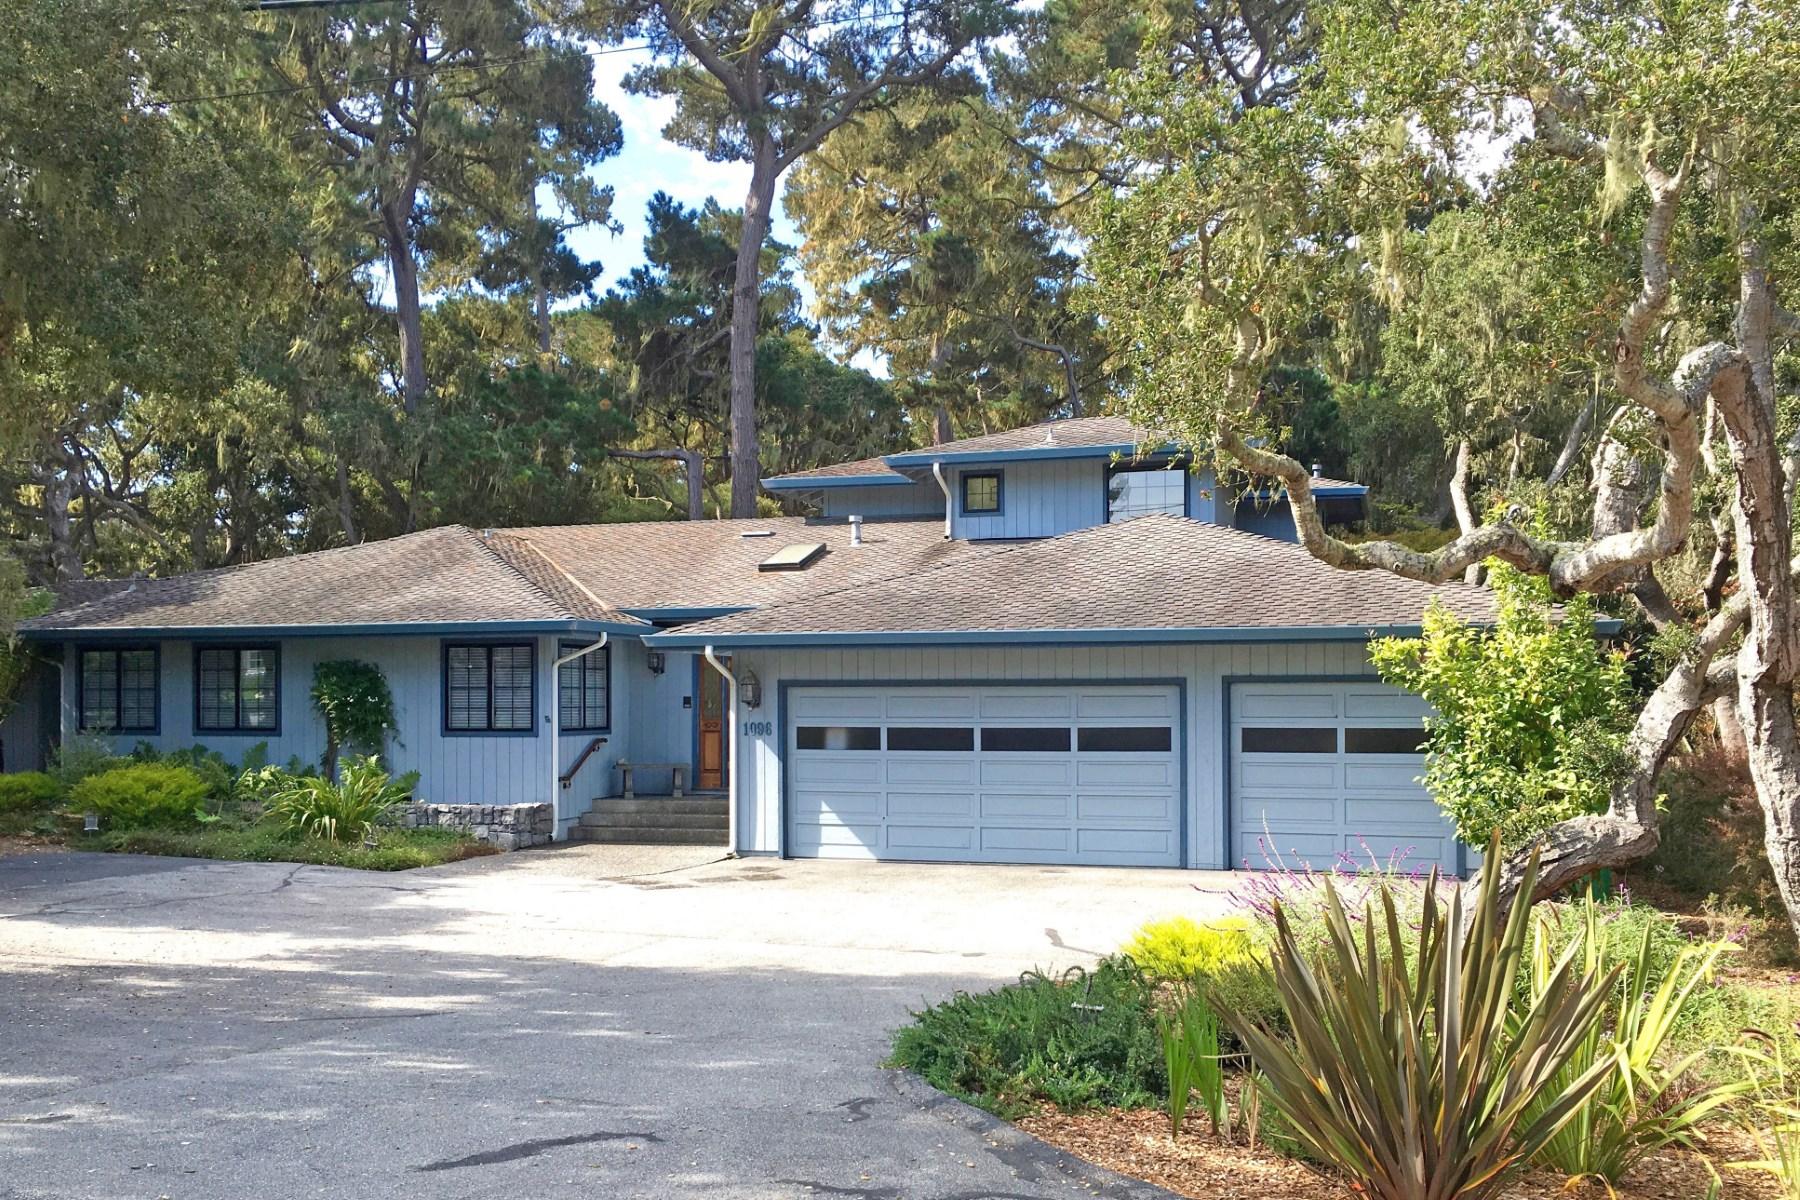 Vivienda unifamiliar por un Venta en Pebble Beach, California 1096 Sawmill Gulch Rd Pebble Beach, California, 93953 Estados Unidos